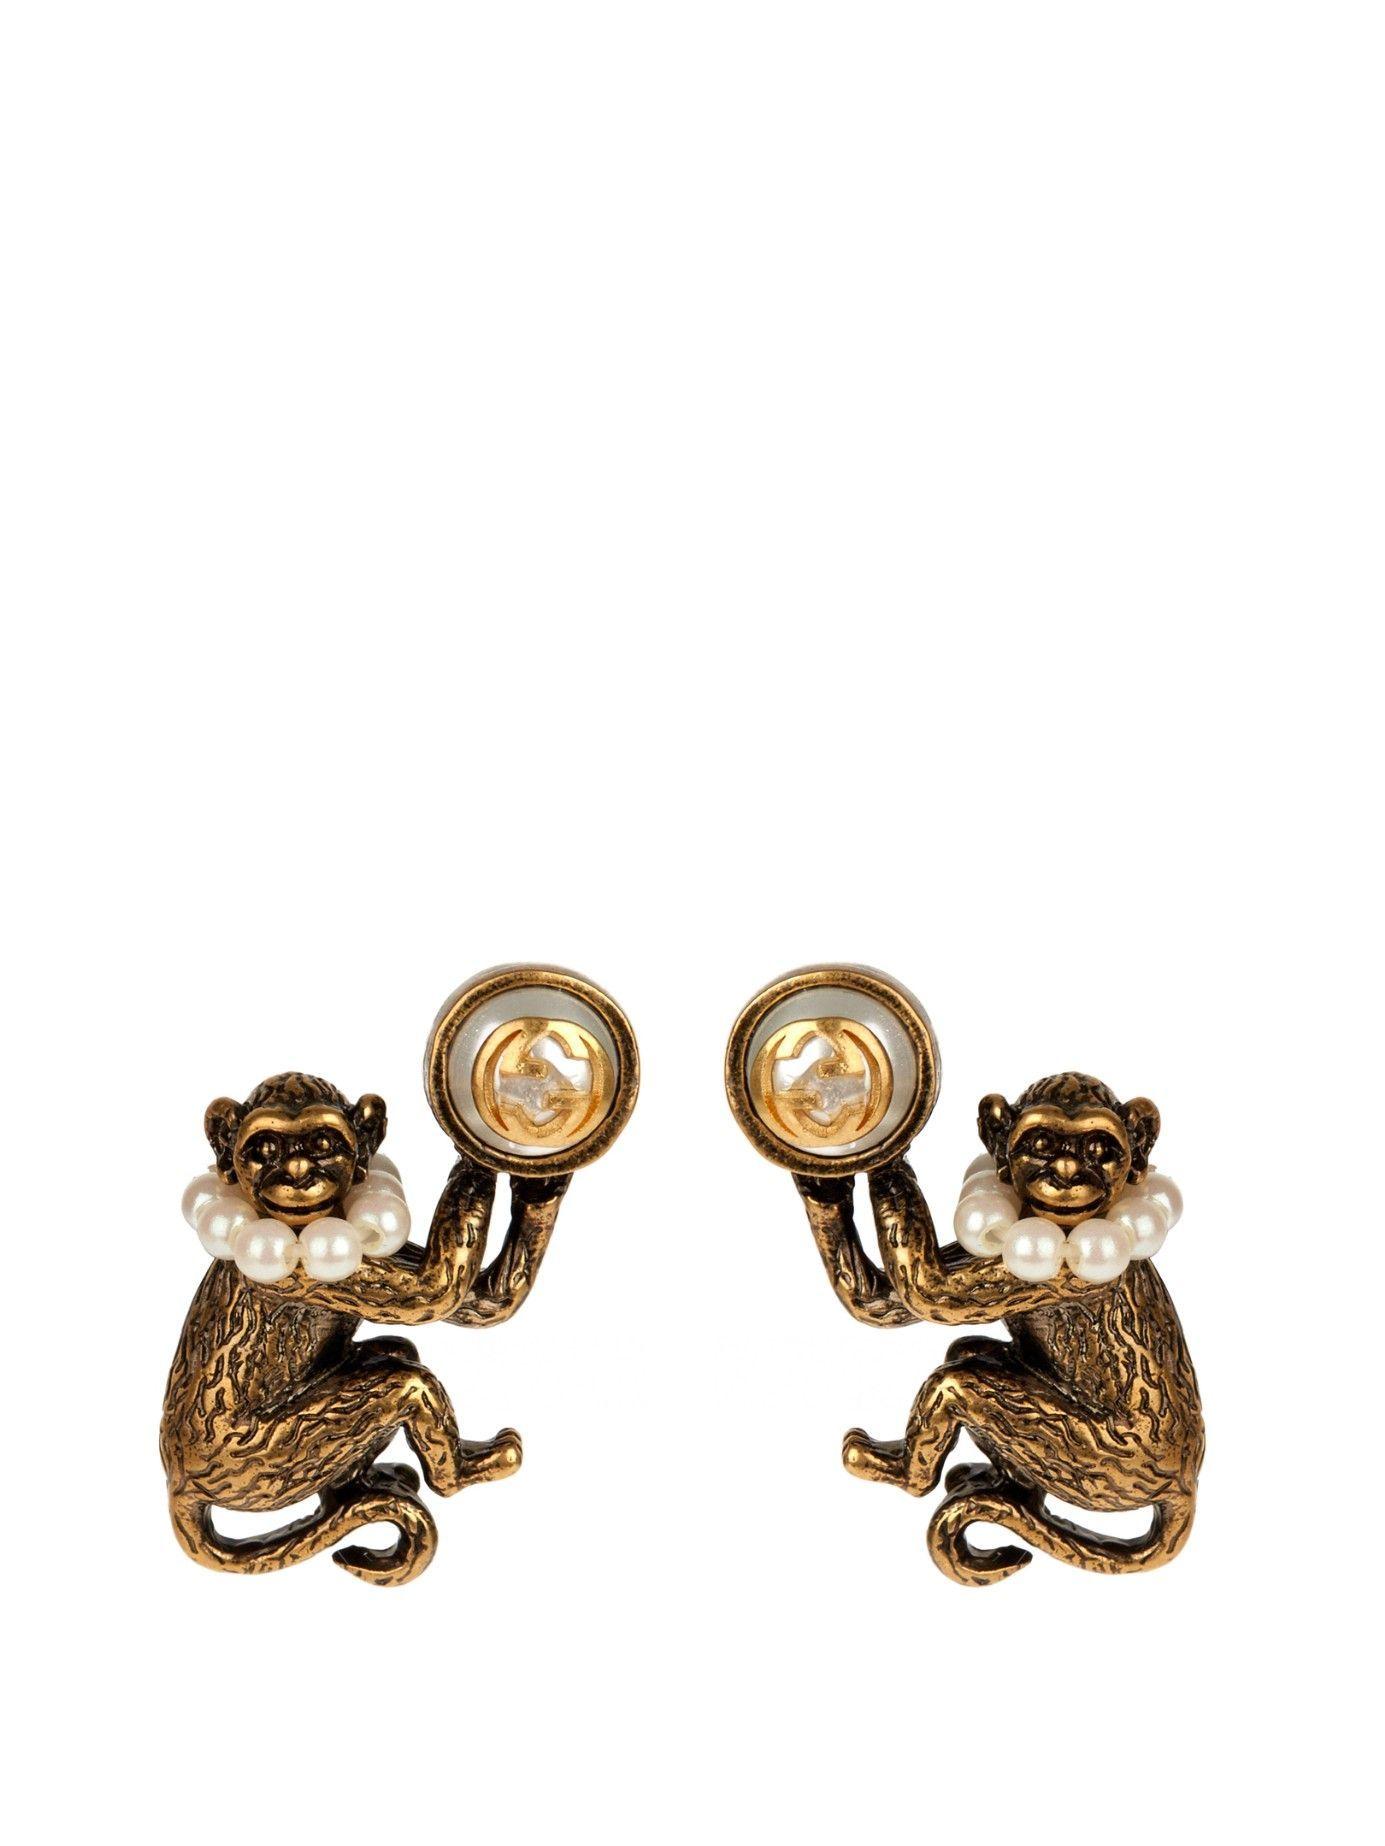 c6638aca988 Monkey brass and glass-pearl earrings